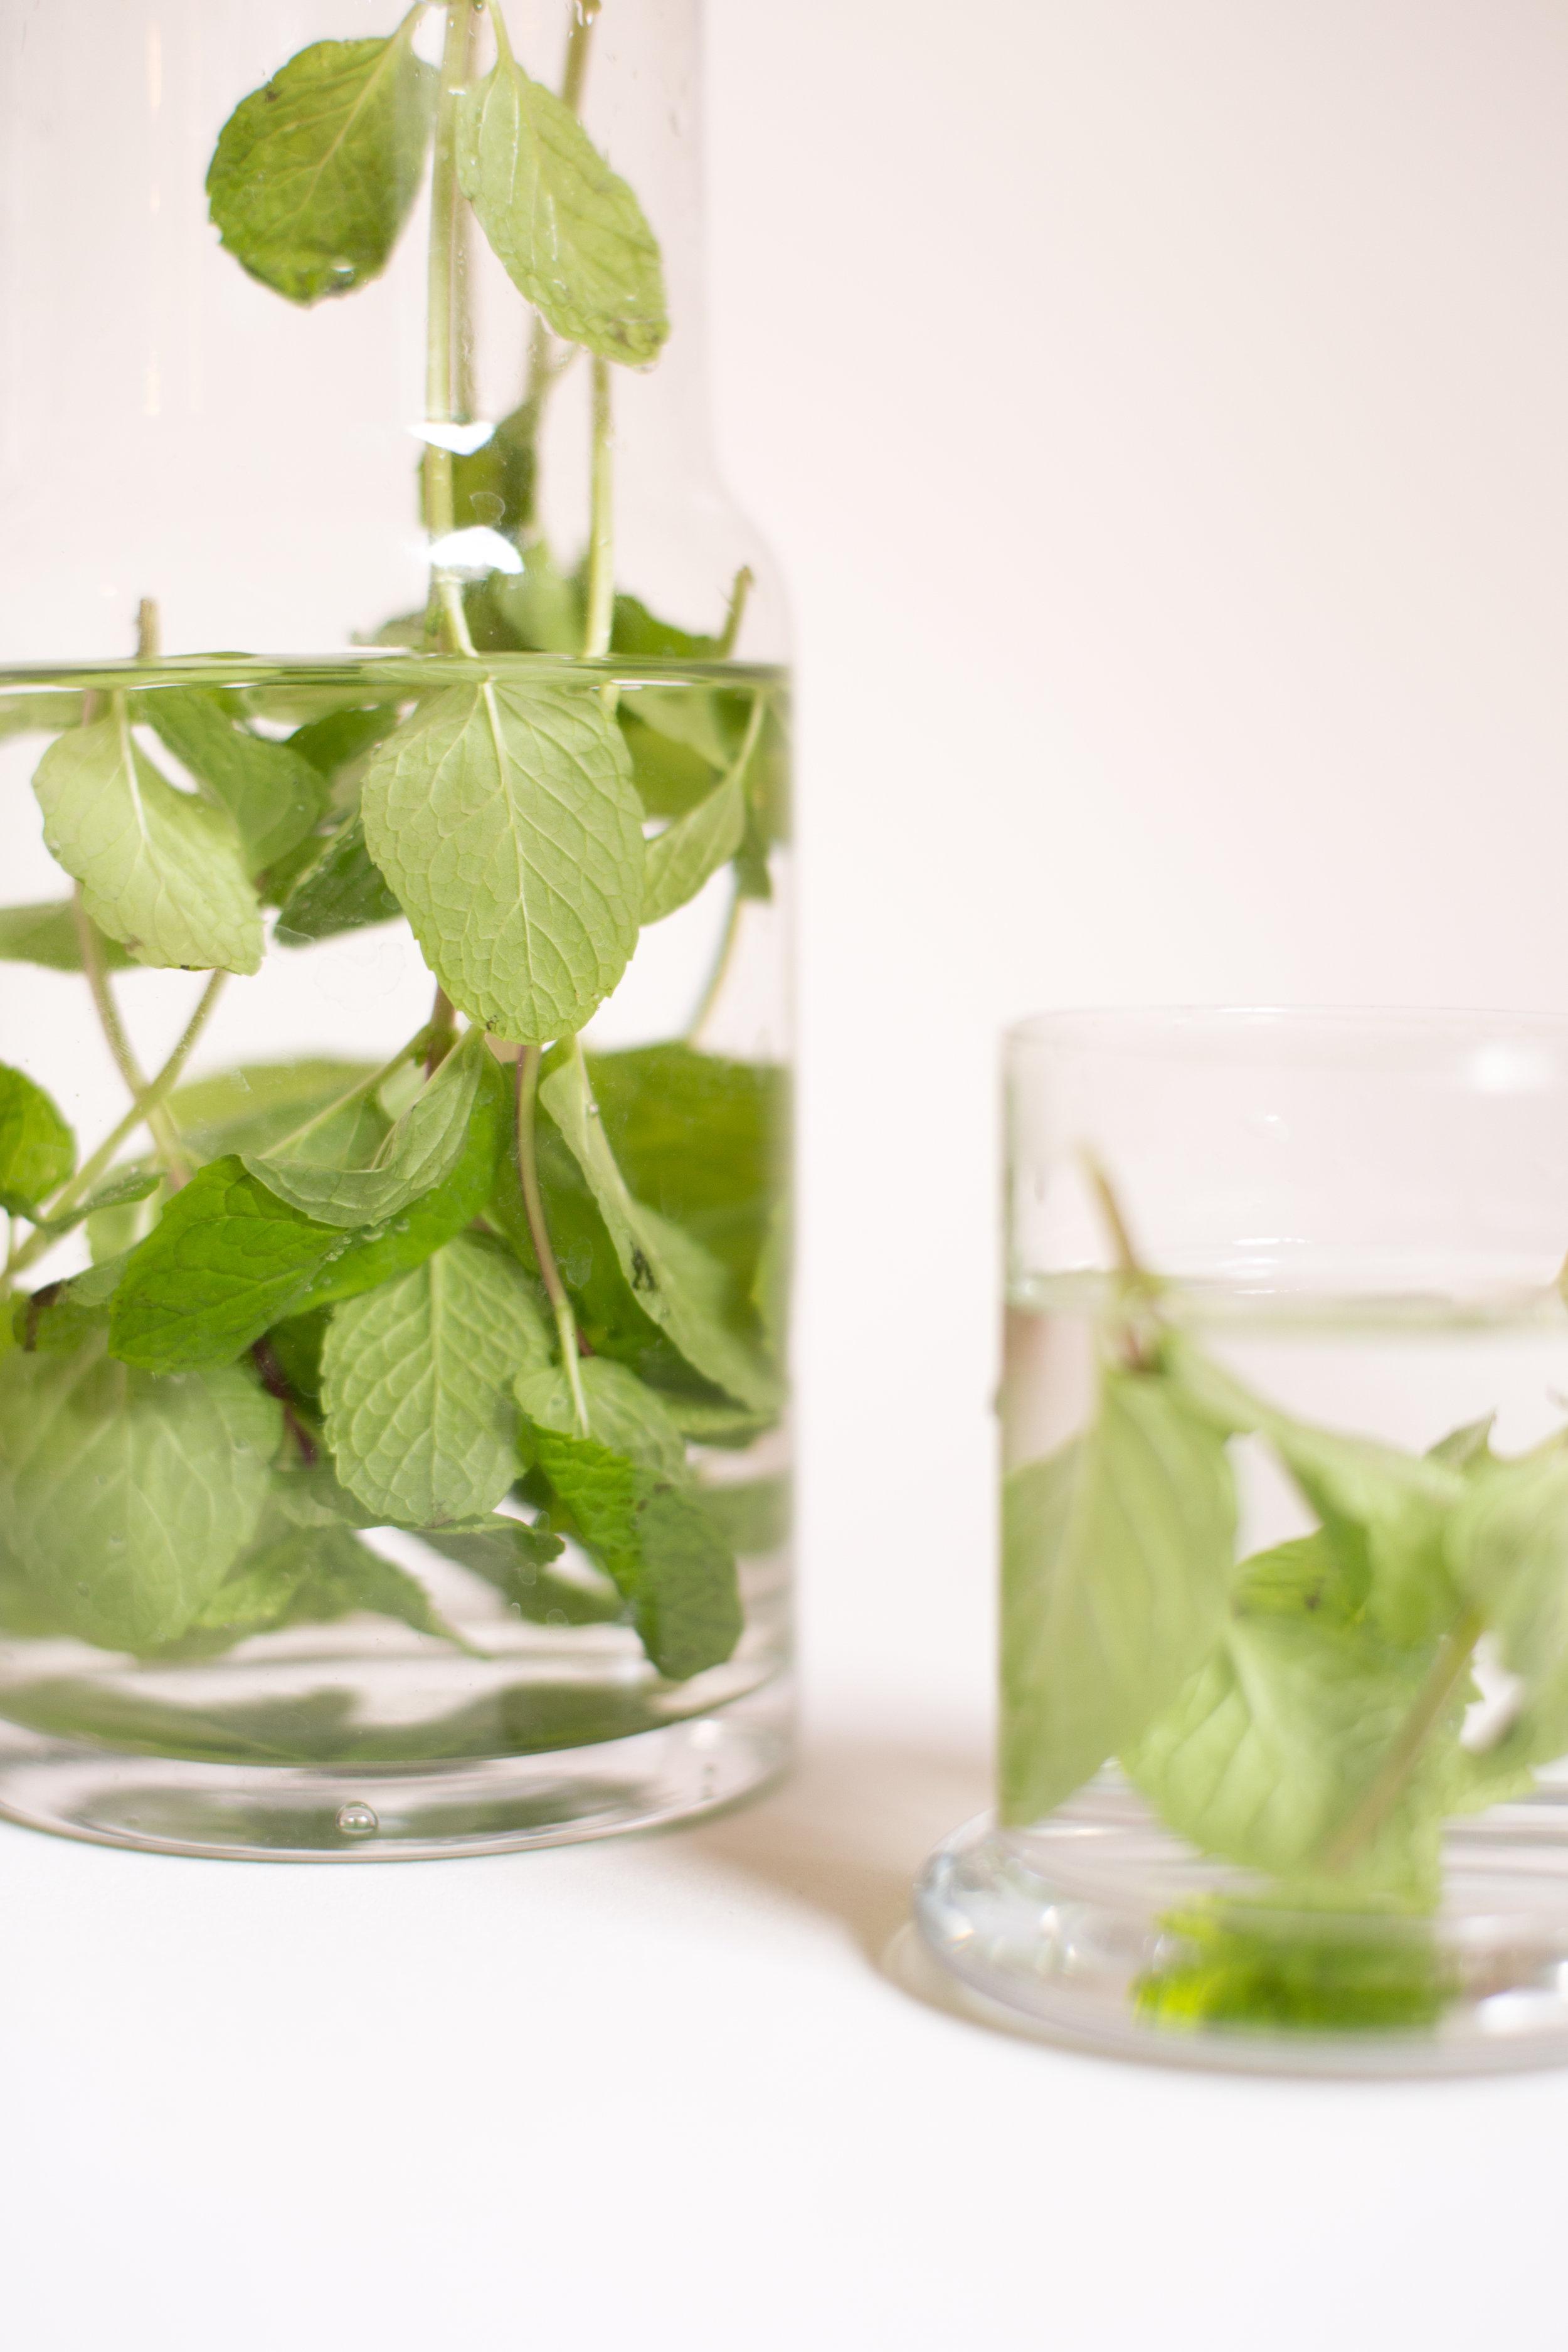 mint-plants-and-herbs.jpg